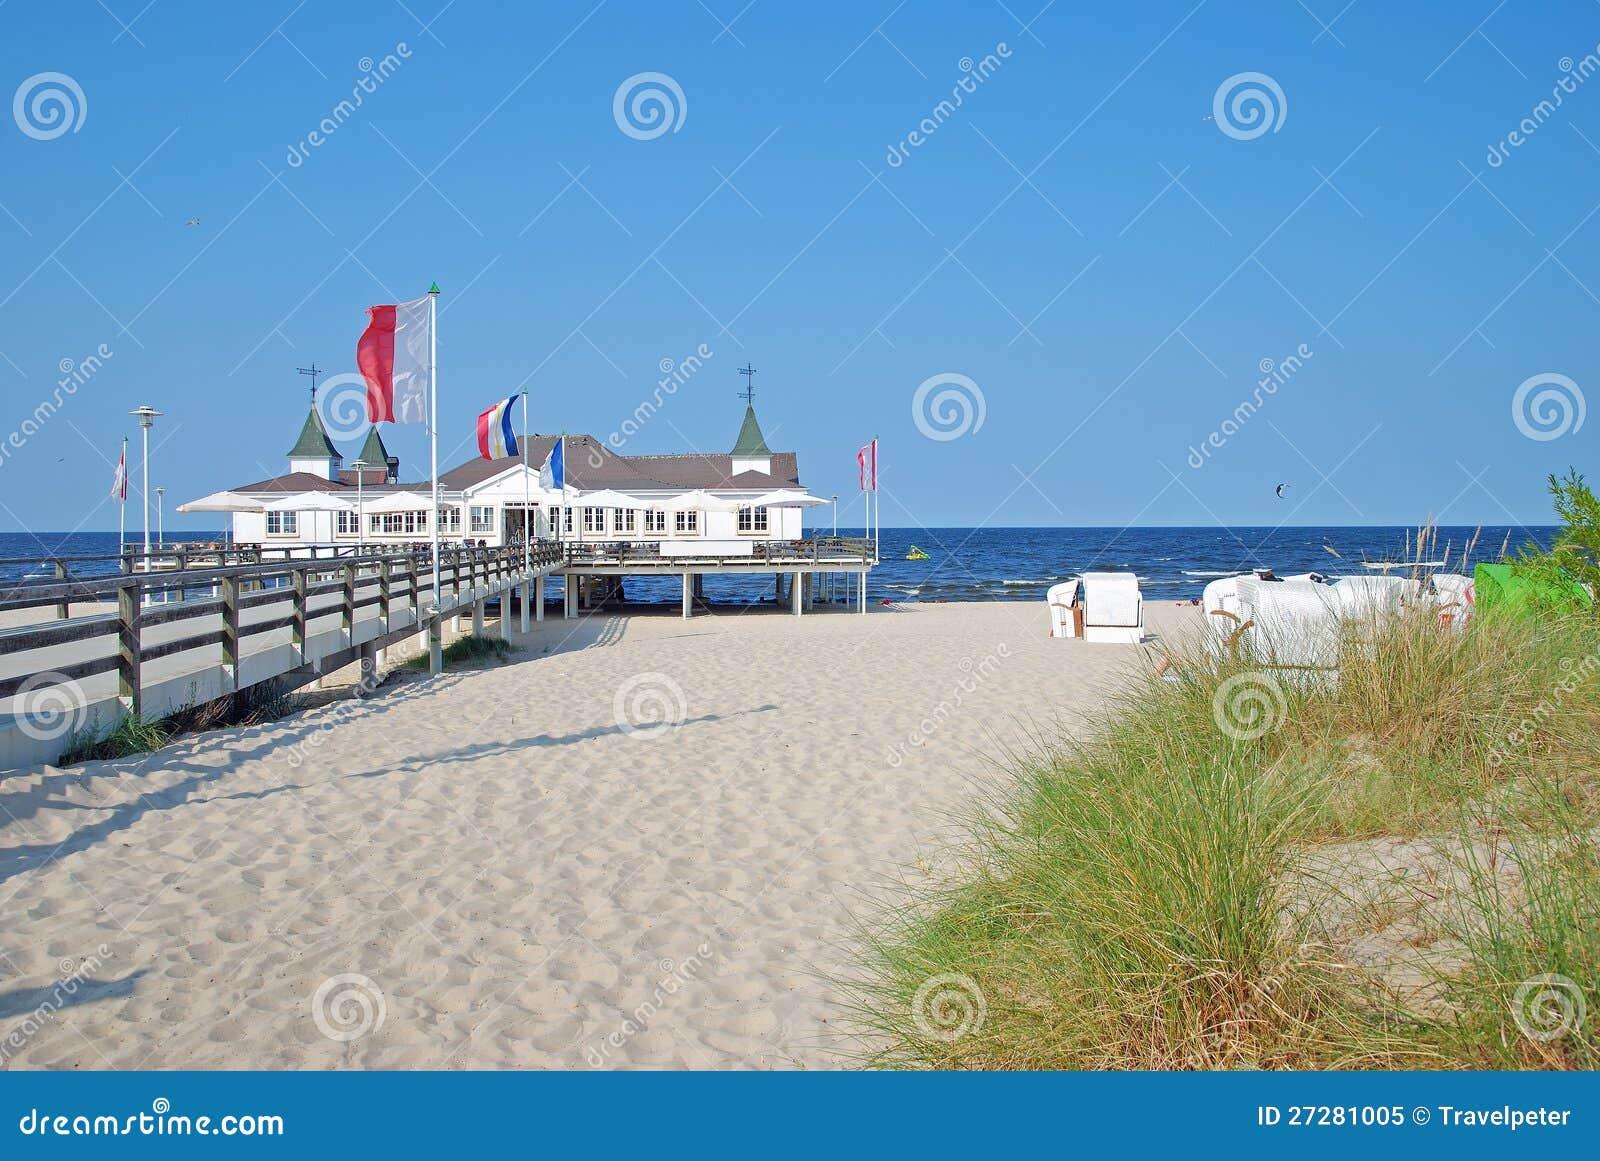 Ahlbeck, usedom Insel, Ostsee, Deutschland